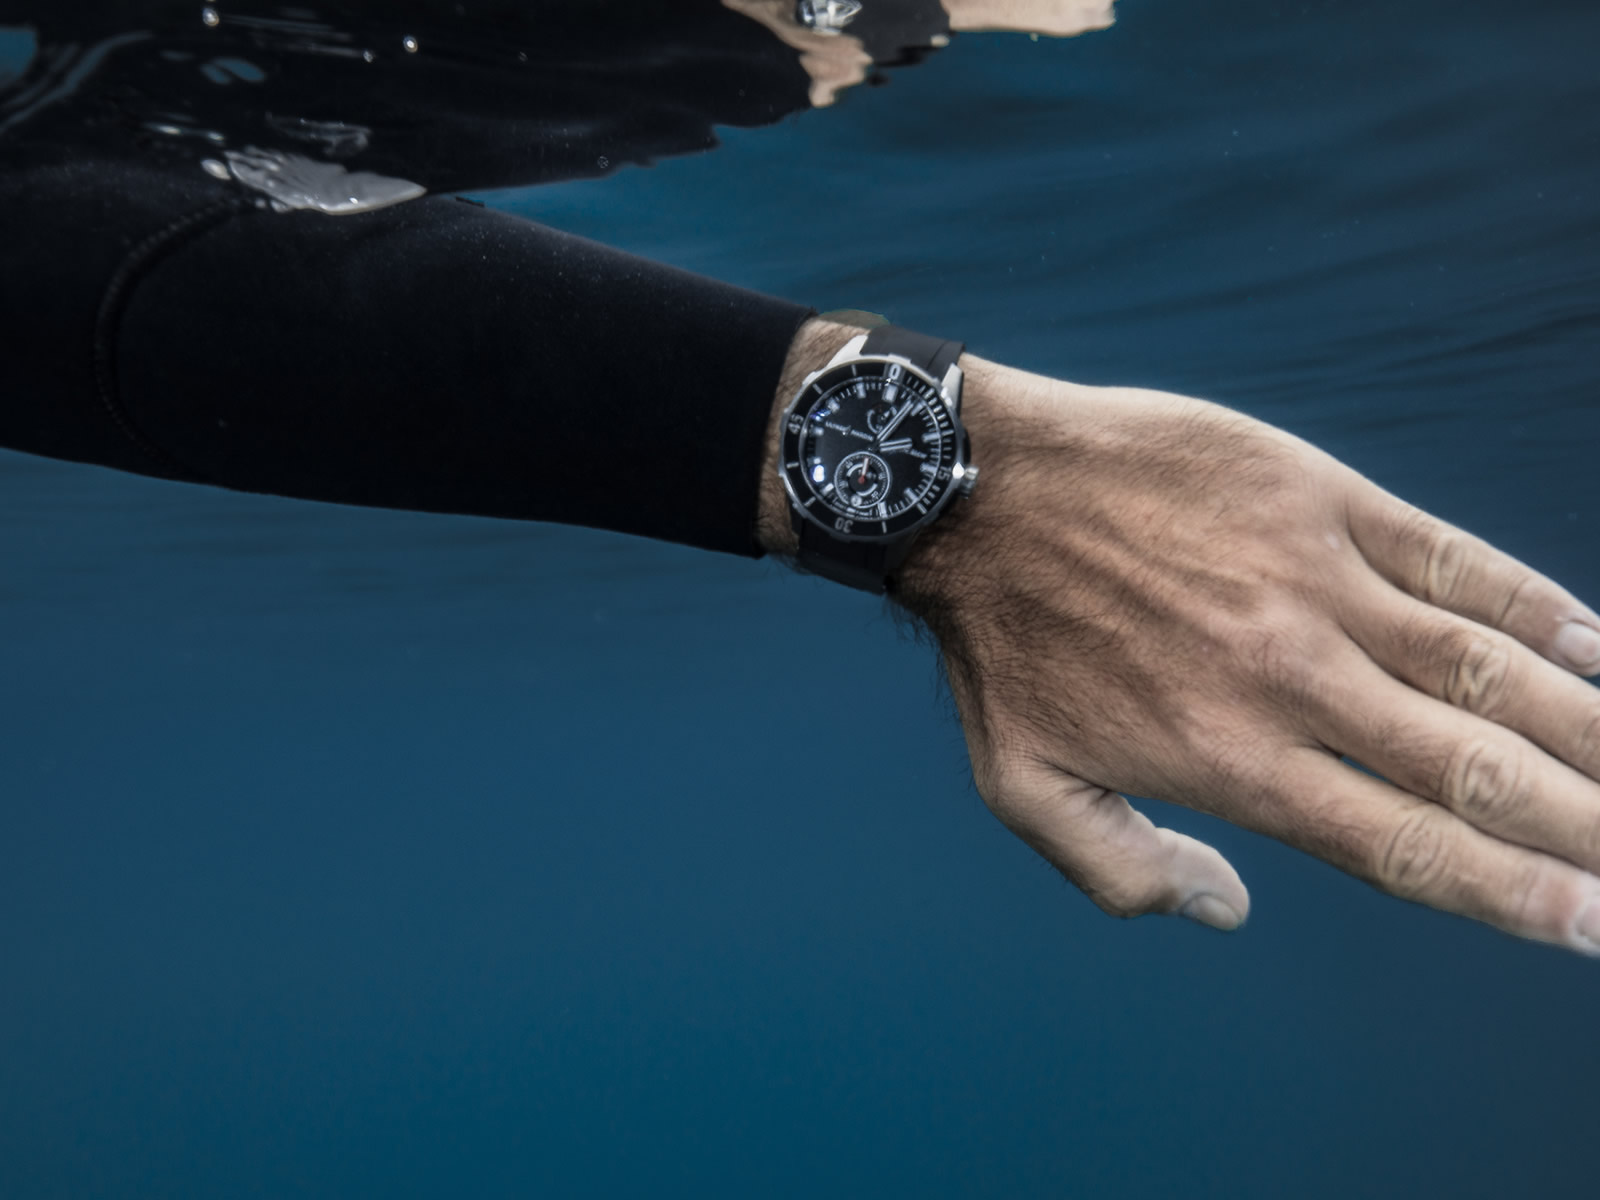 ulysse-nardin-diver-chronometer-2018-models-1-.jpg